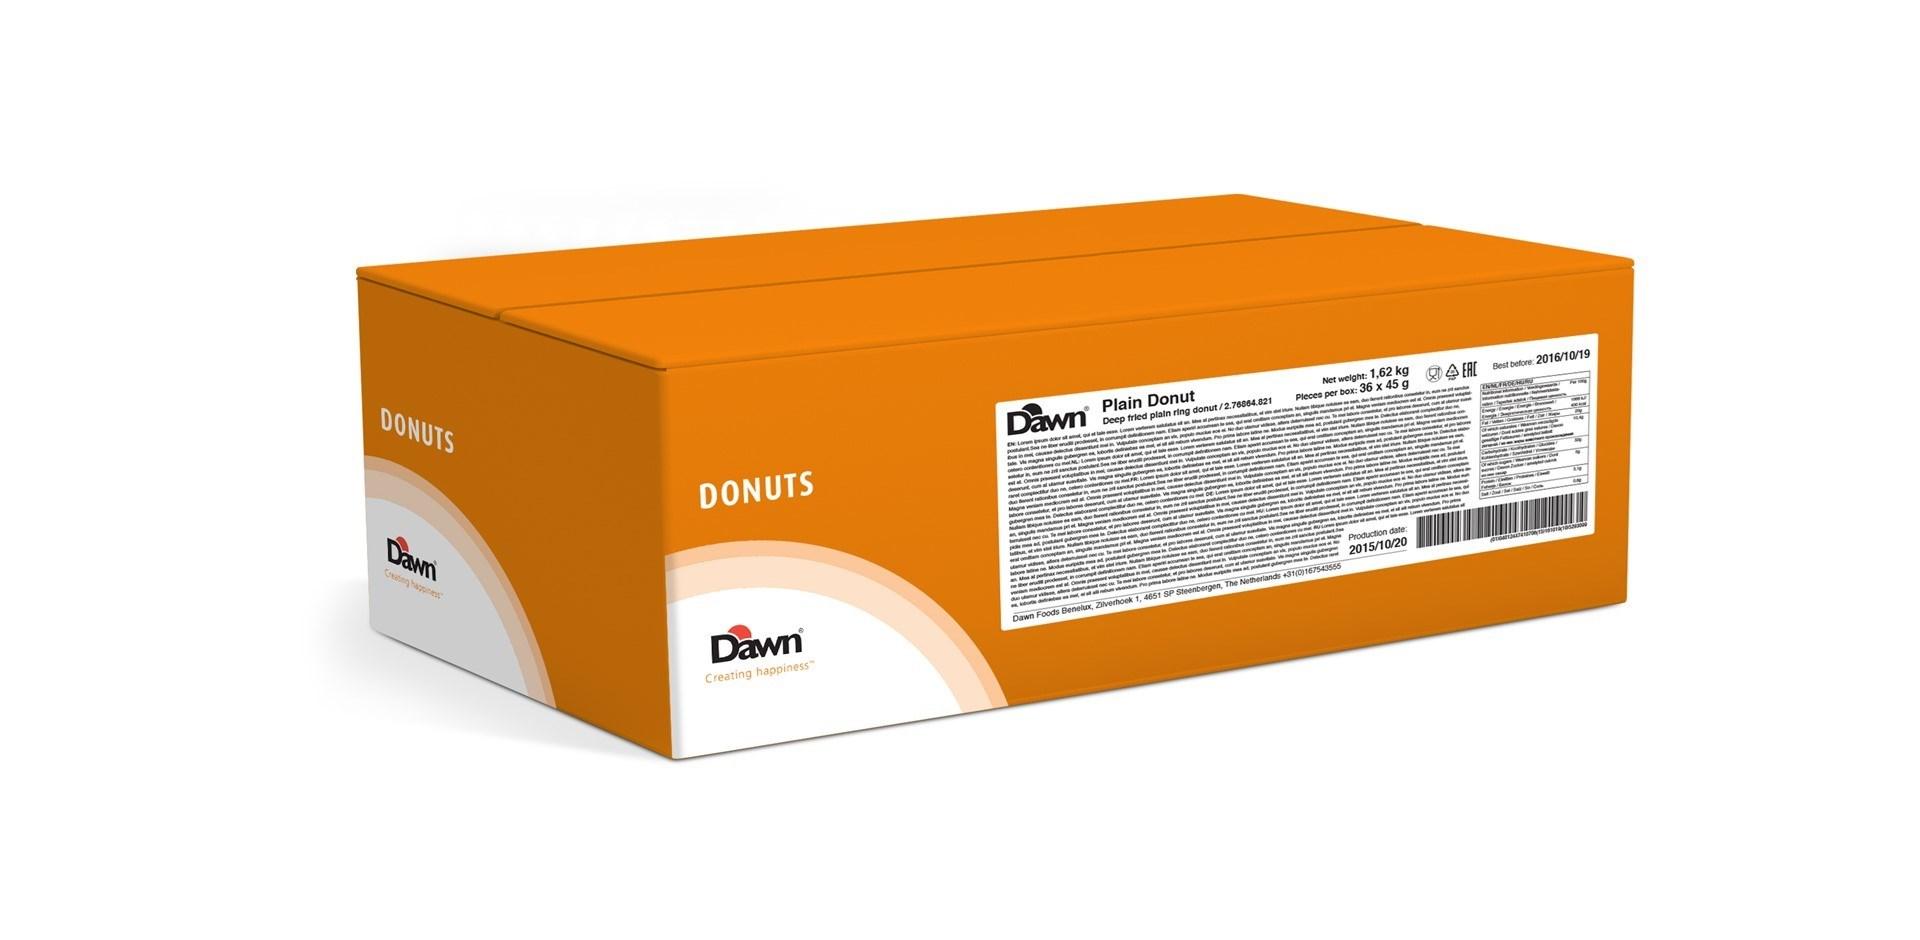 Productafbeelding Dawn Plain Donut 3x12 stuks doos